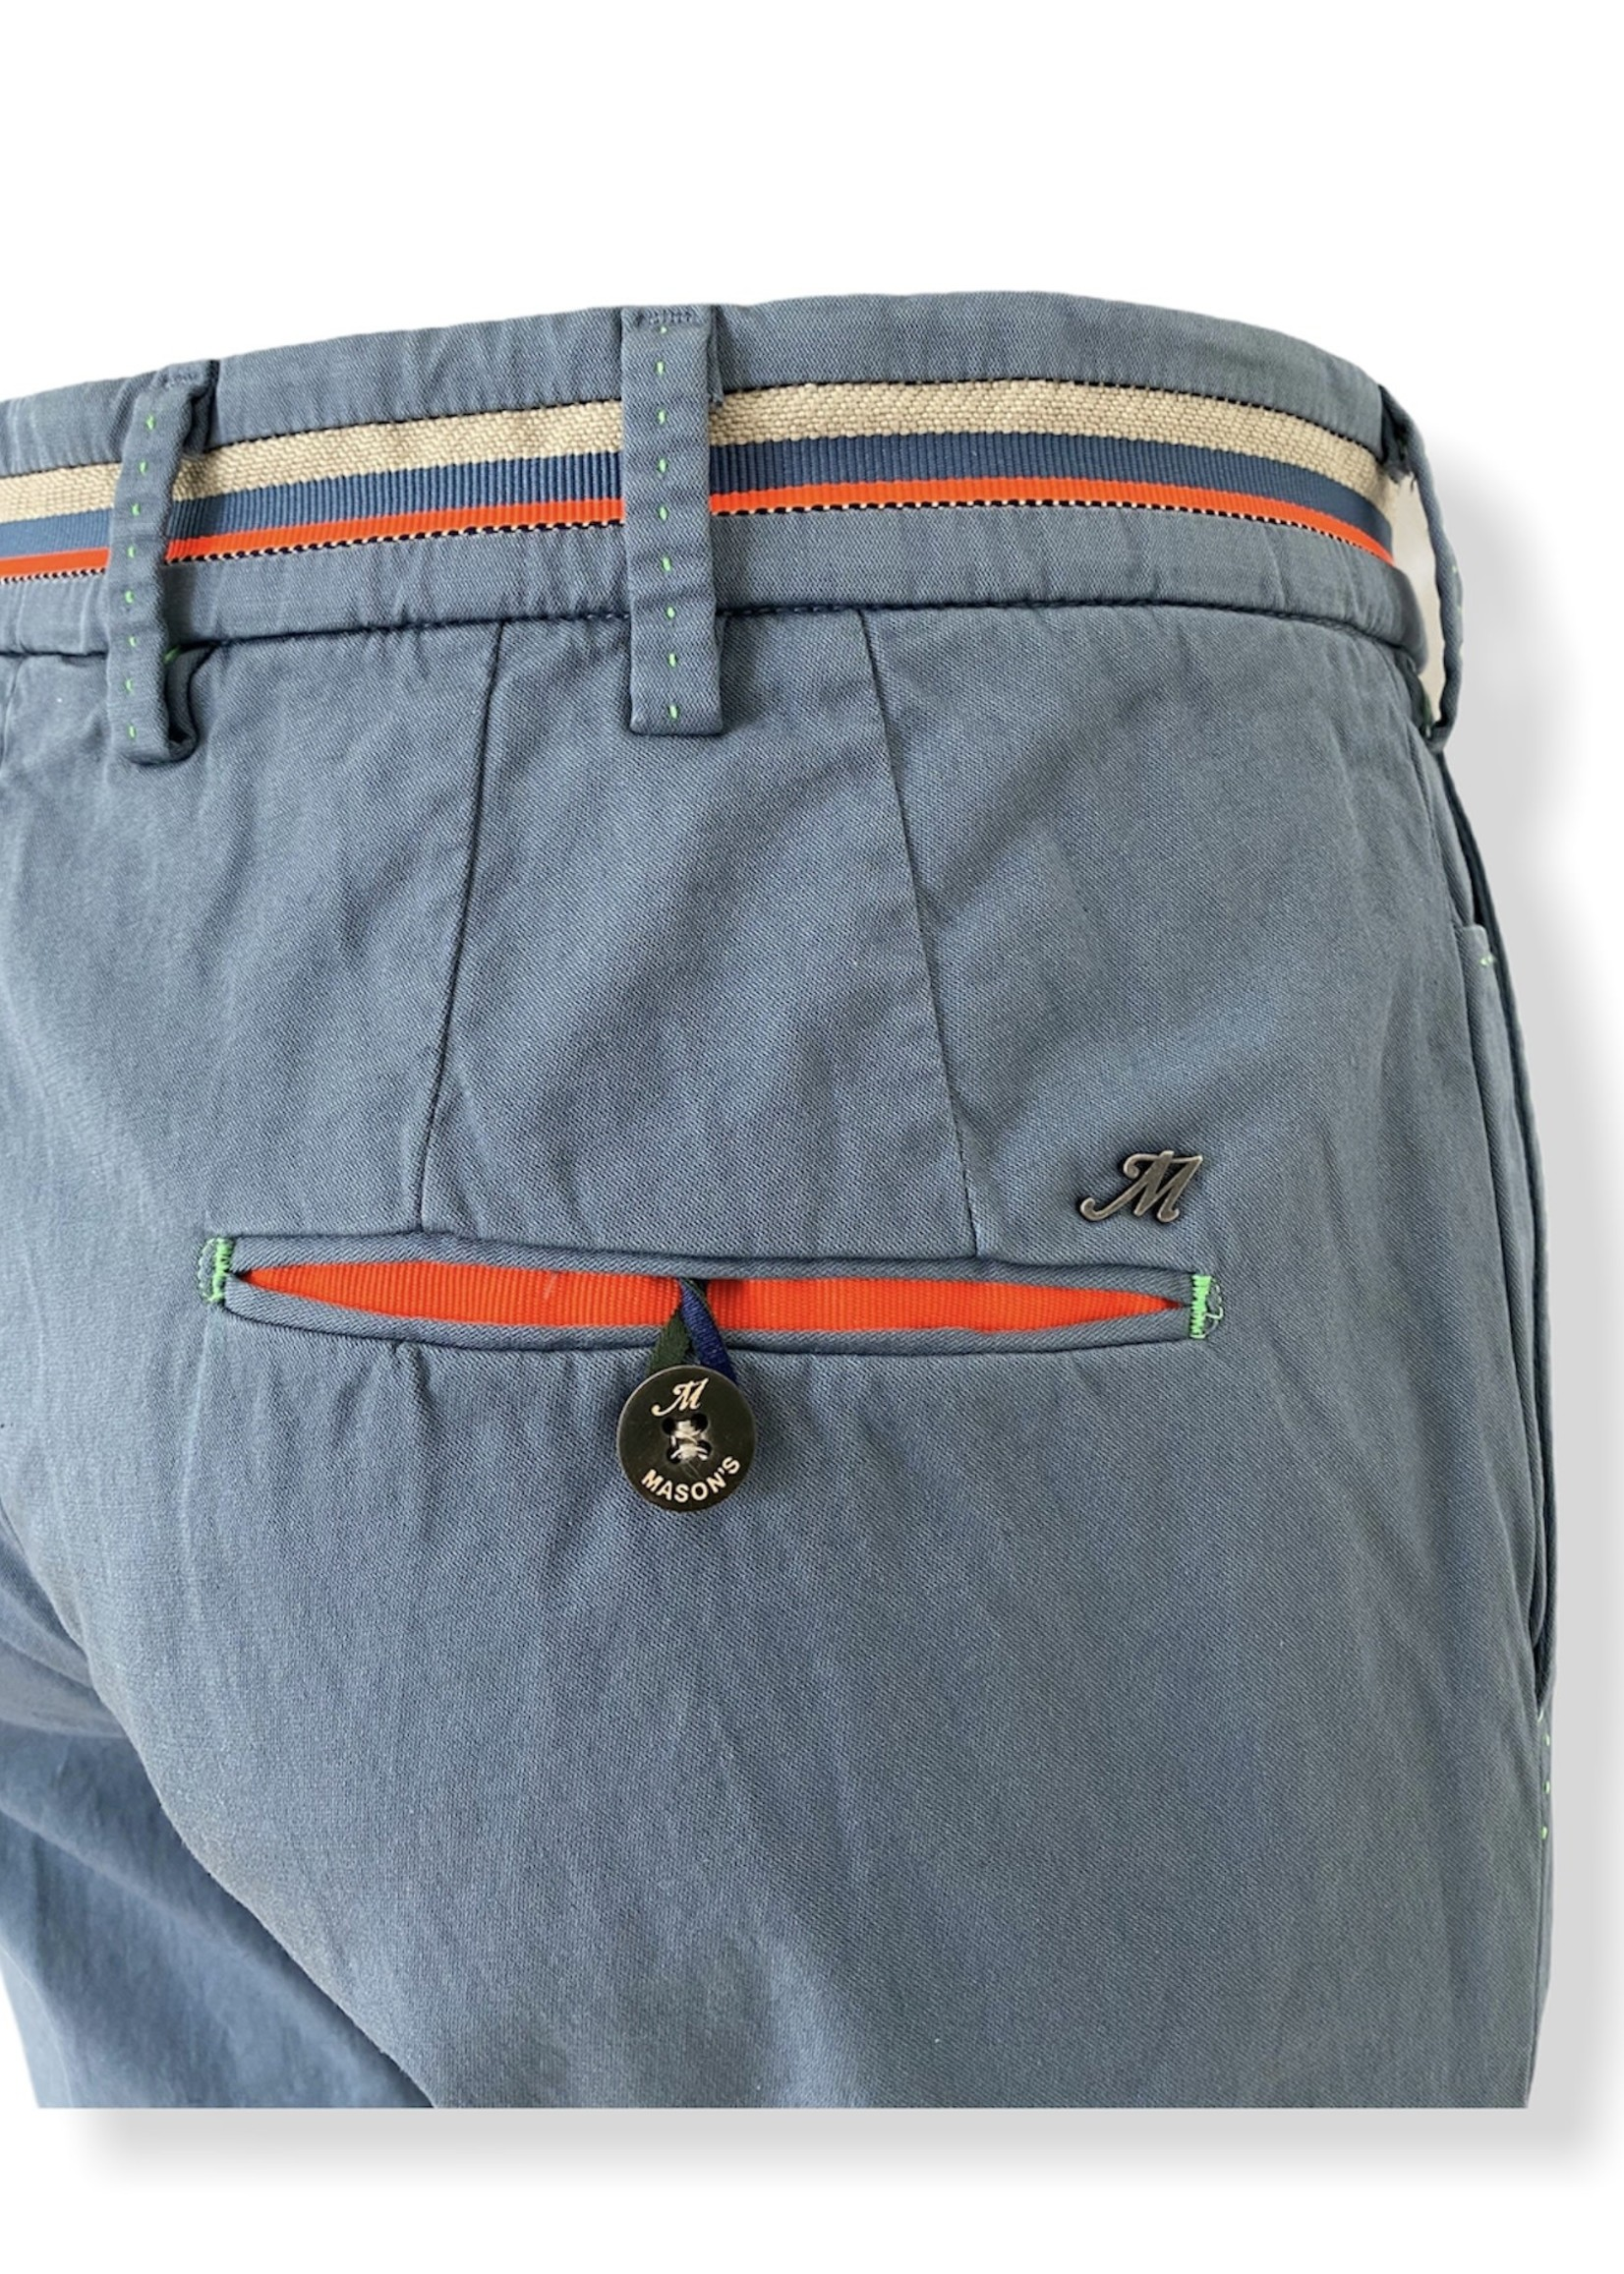 Mason's Pantalon en satin stretch coupe extra slim Milano Start | Bleu ciel | Mason's